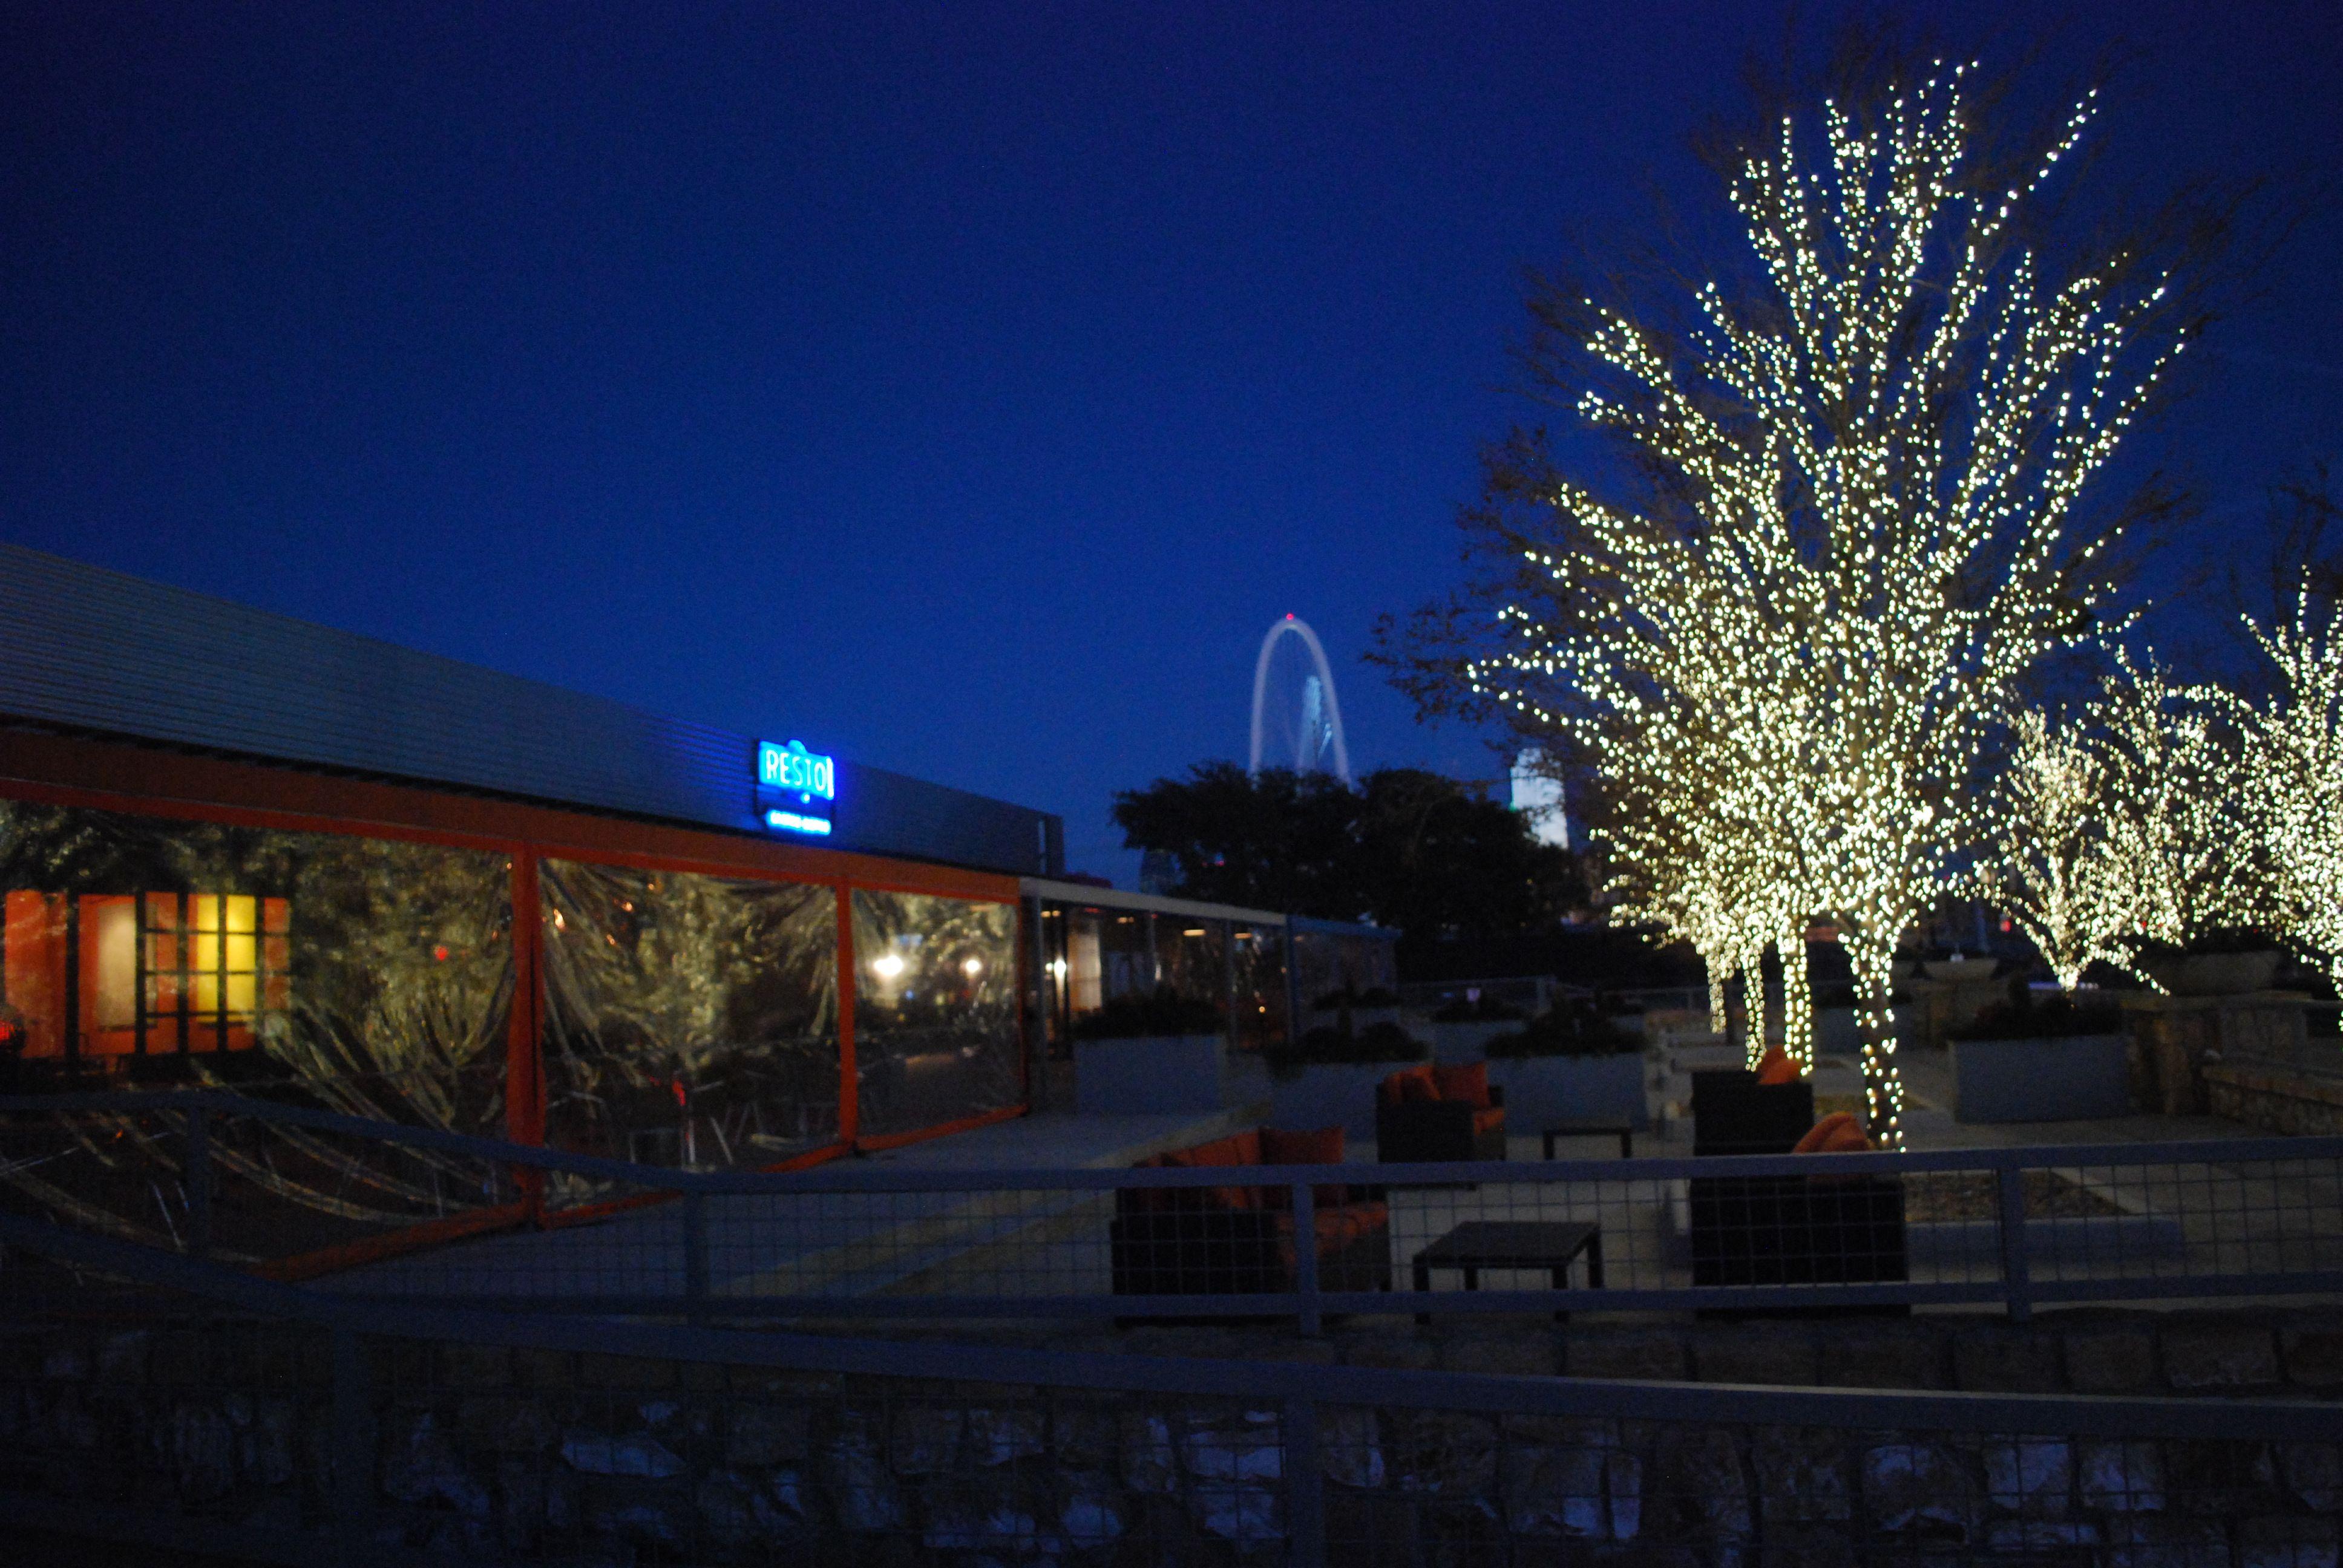 Dusk trinity groves west dallas restaurants ceiling